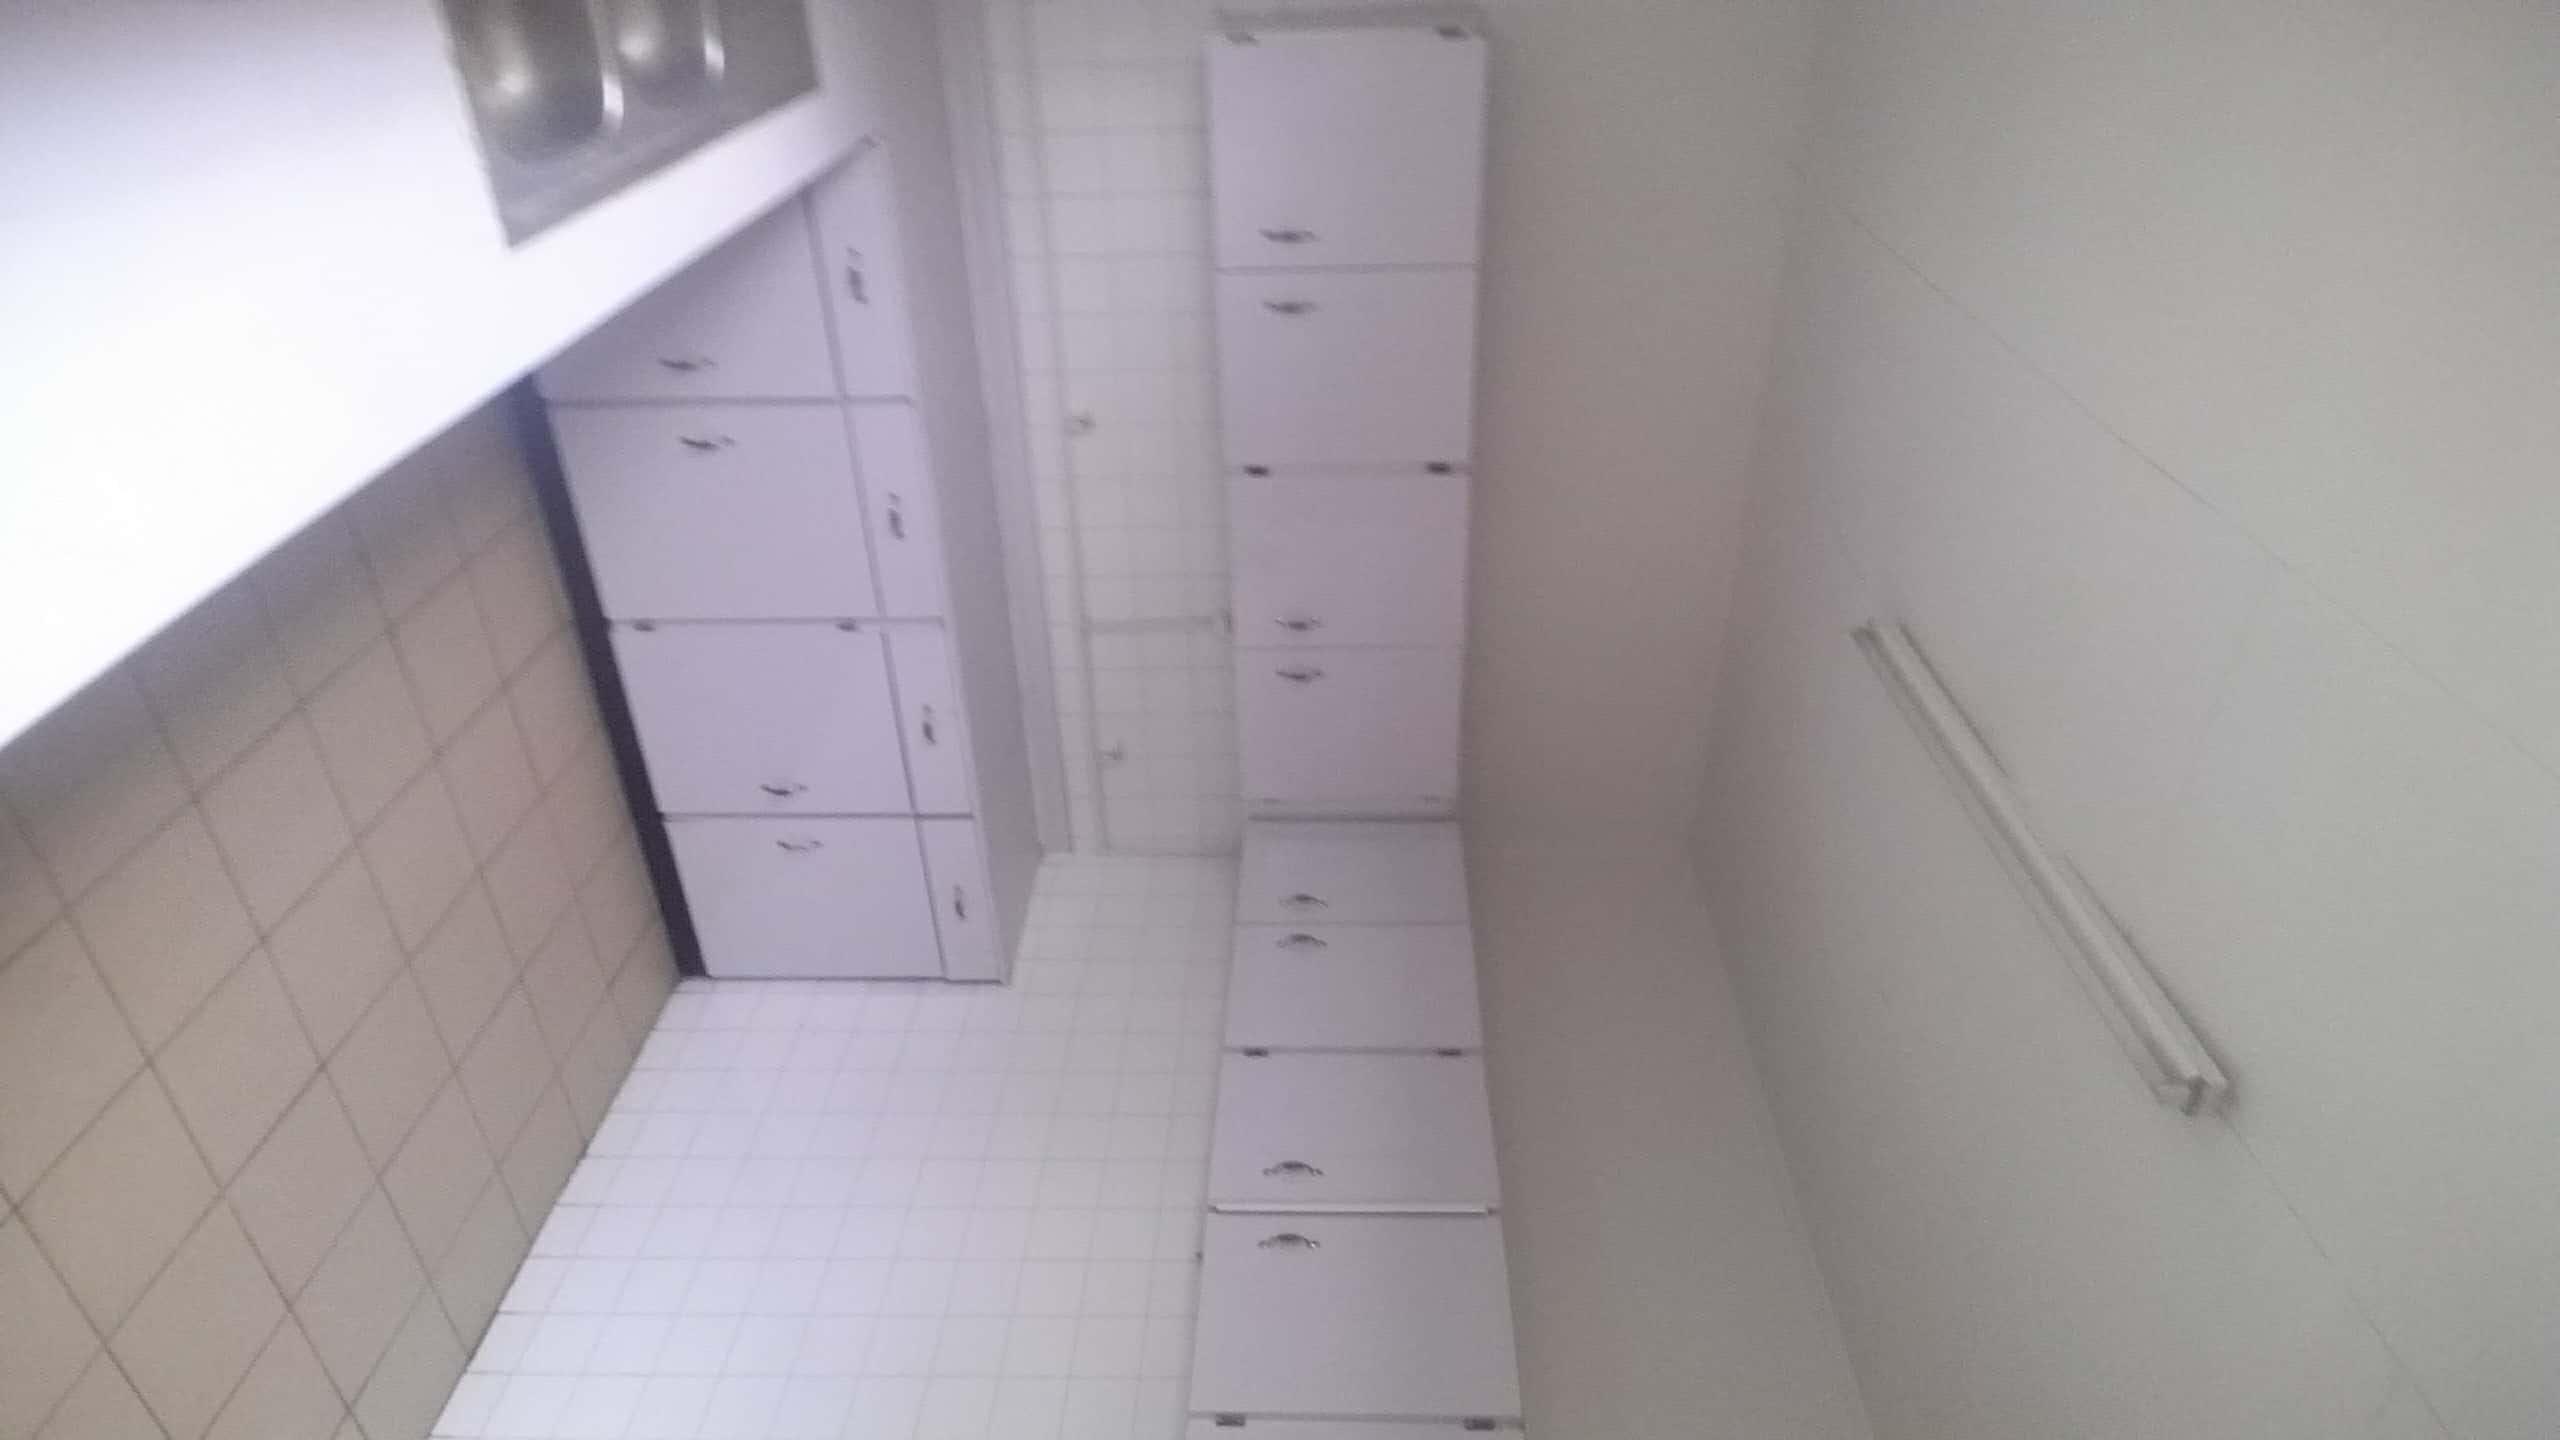 House (Villa) to rent - Yaoundé, Bastos, Carrefour bastos - 1 living room(s), 4 bedroom(s), 4 bathroom(s) - 1 800 000 FCFA / month